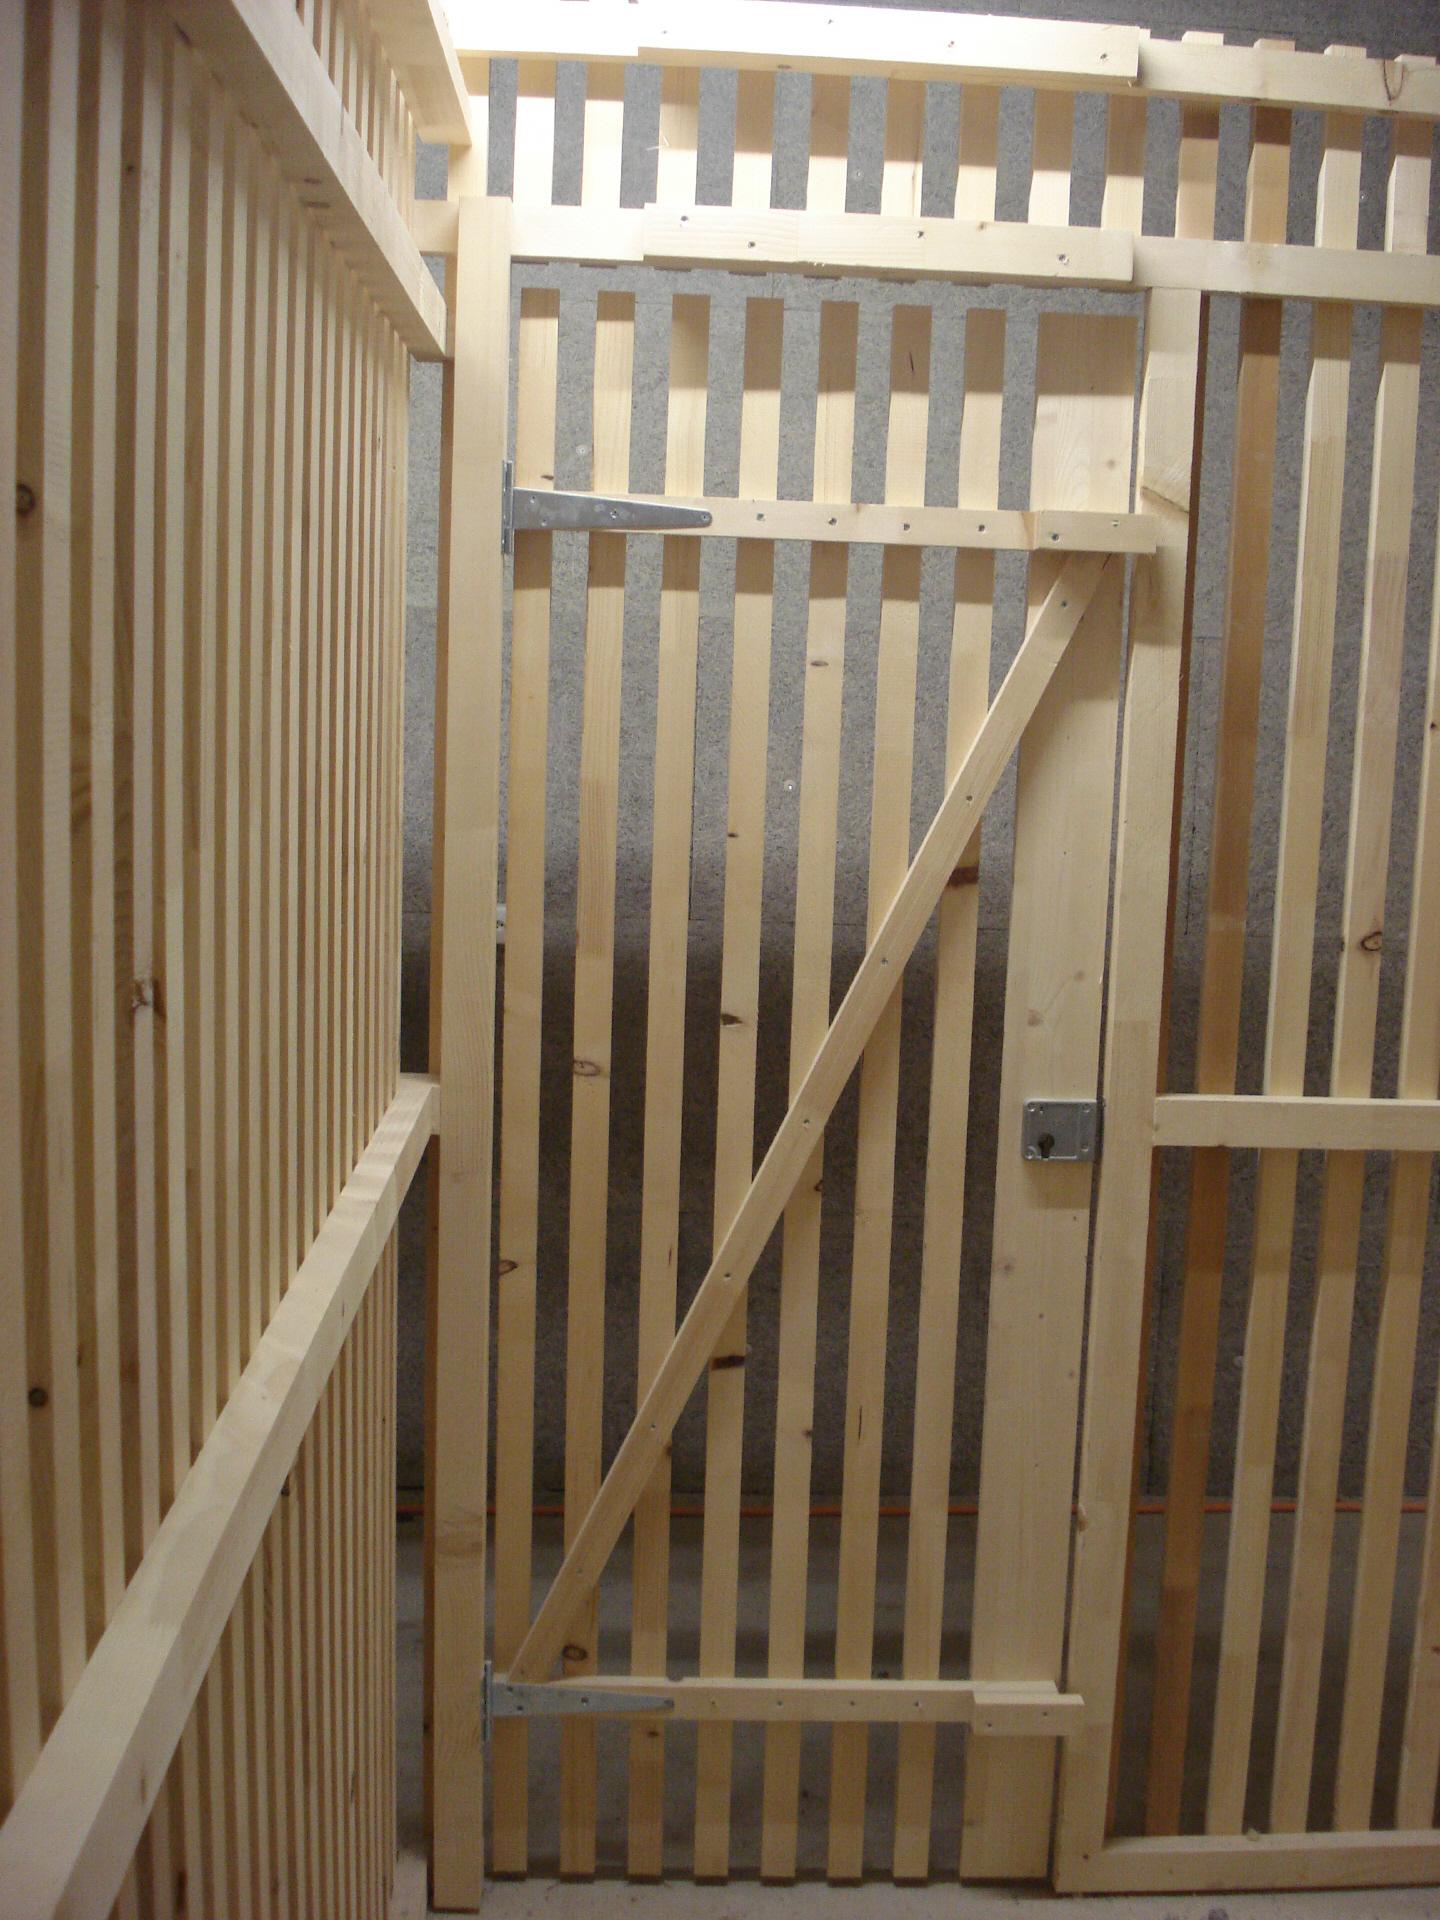 stilvolle treppen selber bauen bilder erindzain. Black Bedroom Furniture Sets. Home Design Ideas